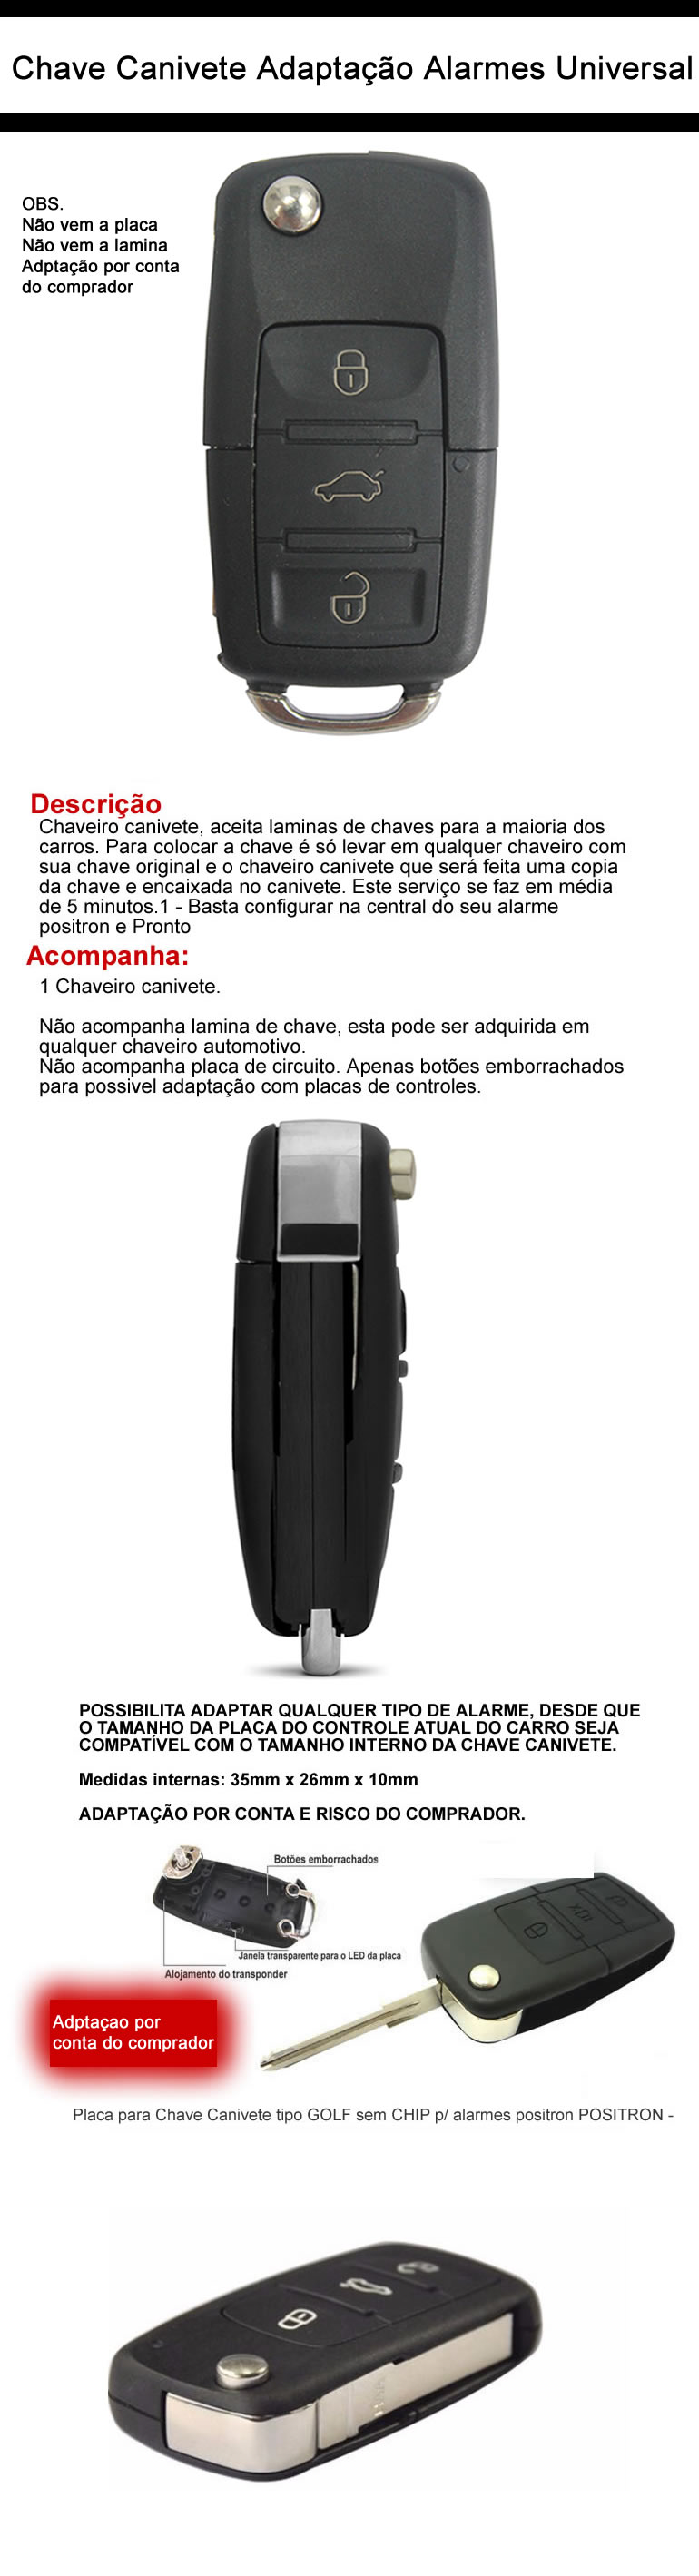 anuncio.jpg (770×1800)